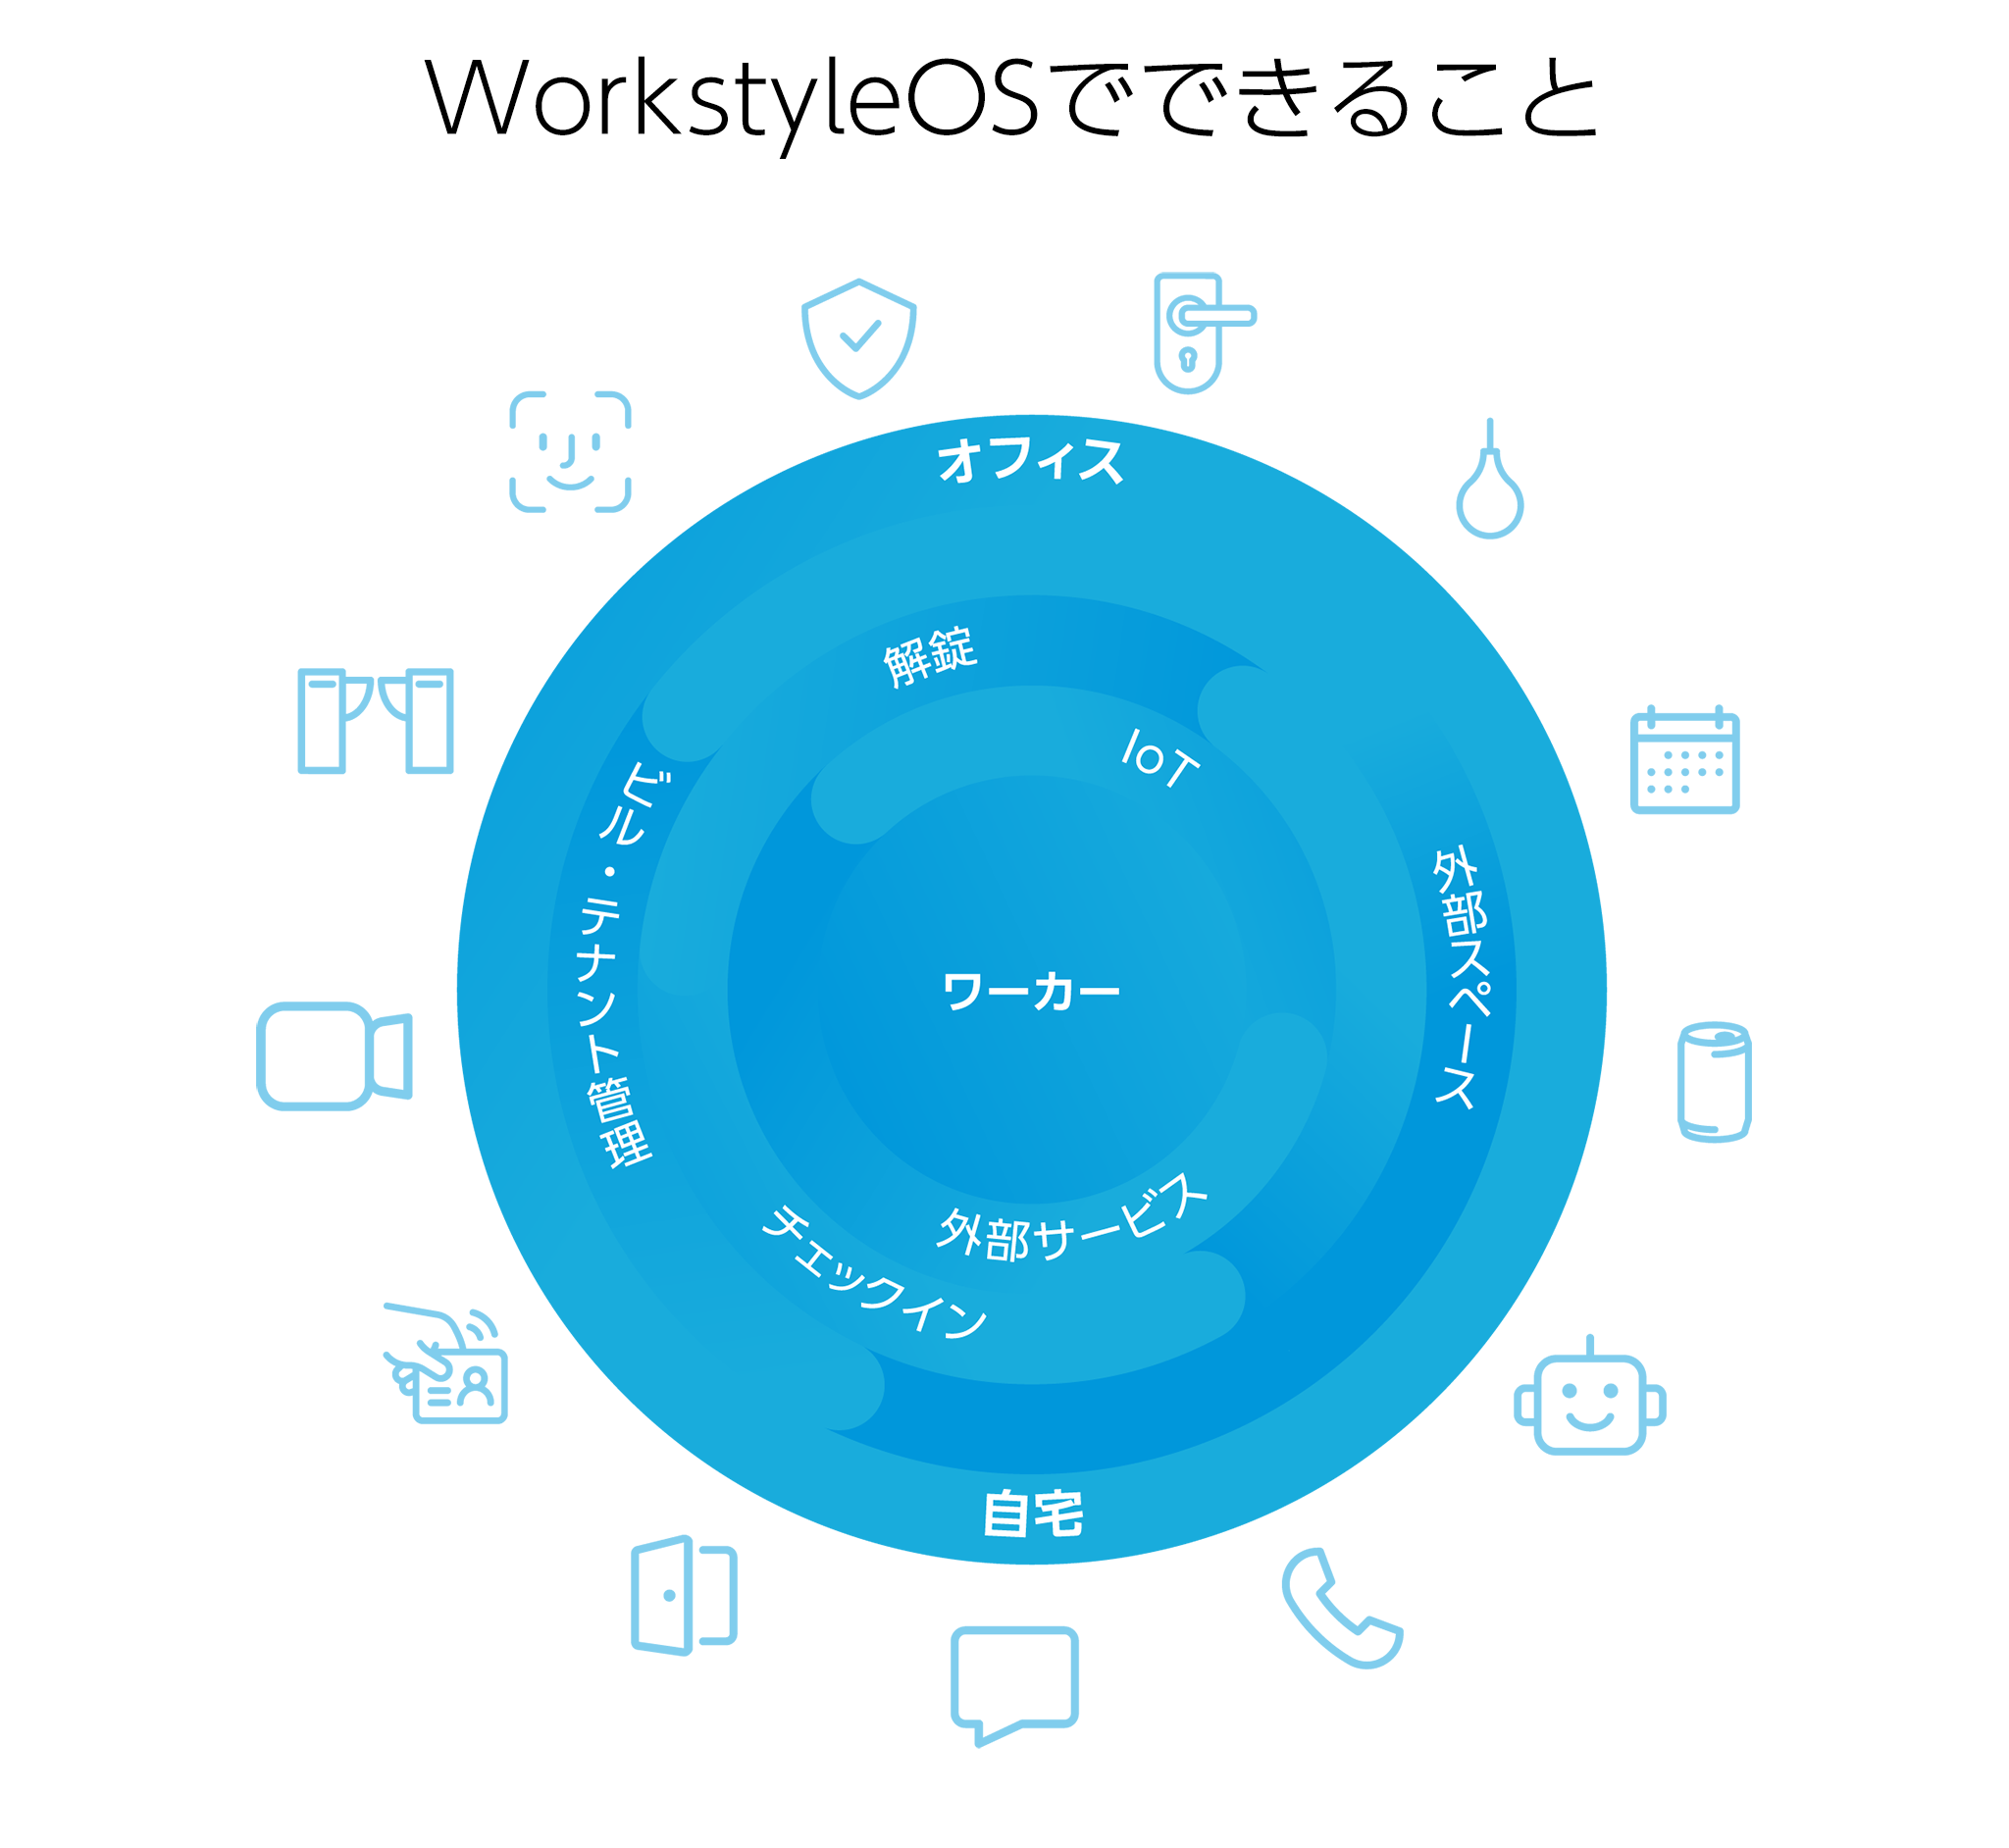 WorkstyleOSでできること-1